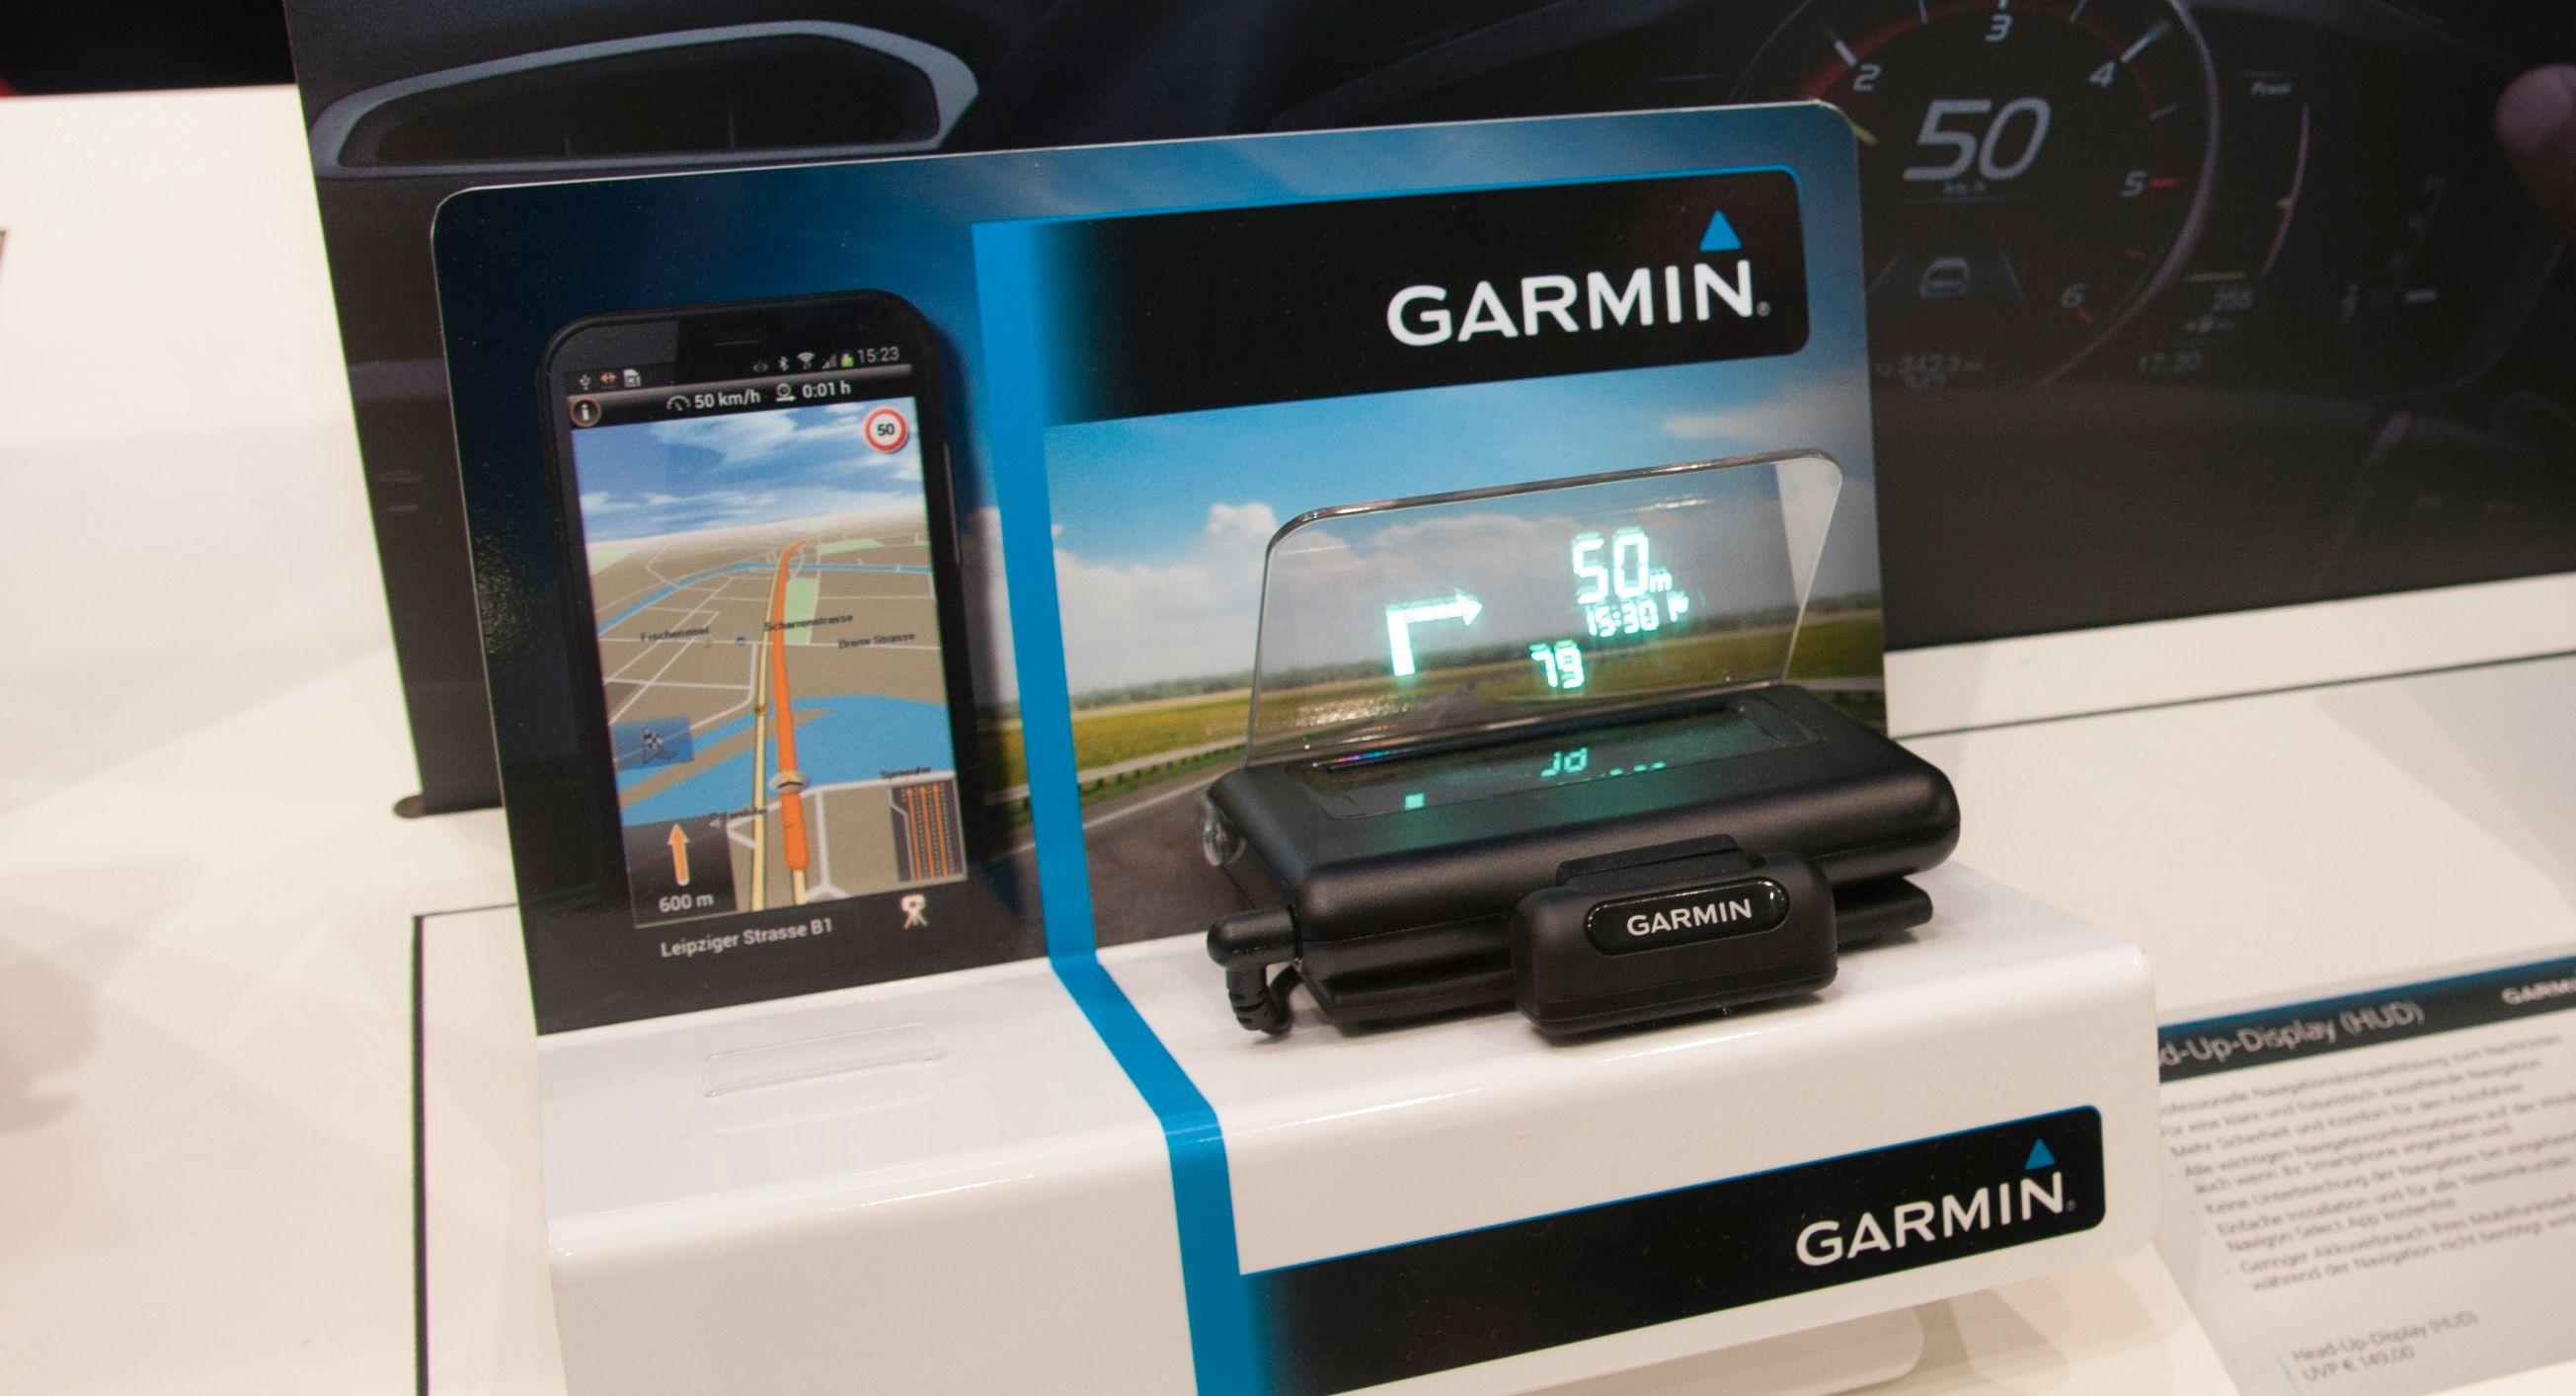 Garmin Heads-up-display: Garmin bruker vinduet ditt som skjerm.Foto: Finn Jarle Kvalheim, Amobil.no